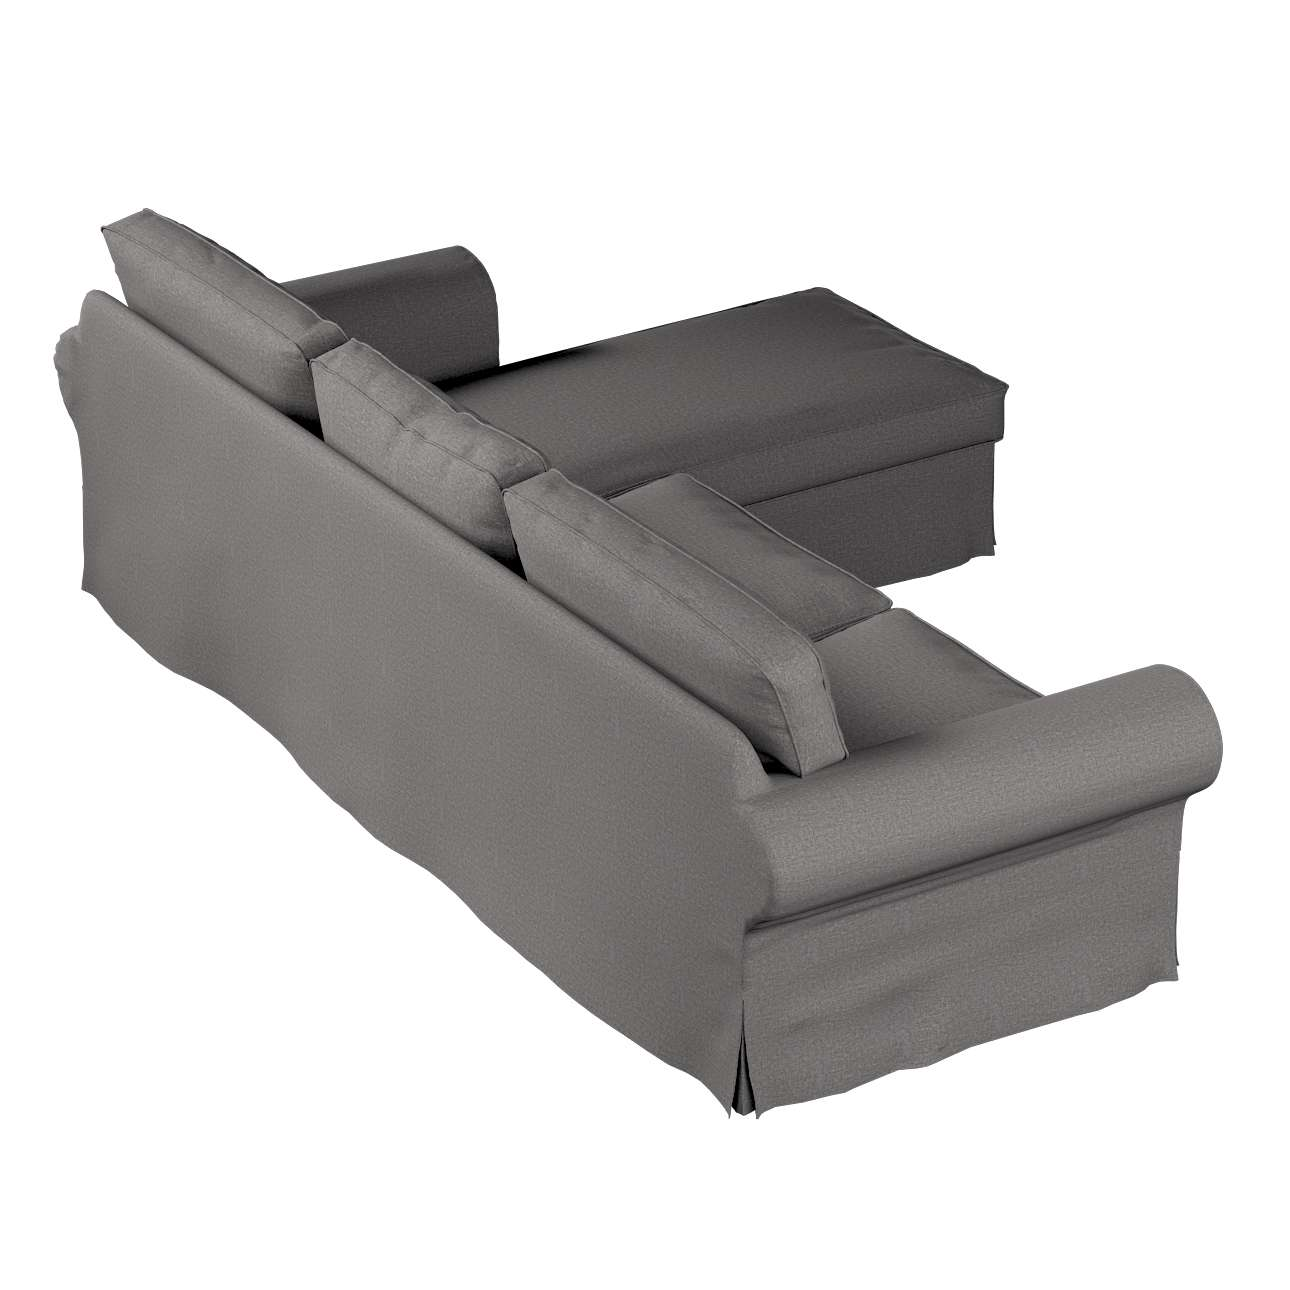 ektorp 2 sitzer sofabezug mit recamiere grau dekoria. Black Bedroom Furniture Sets. Home Design Ideas